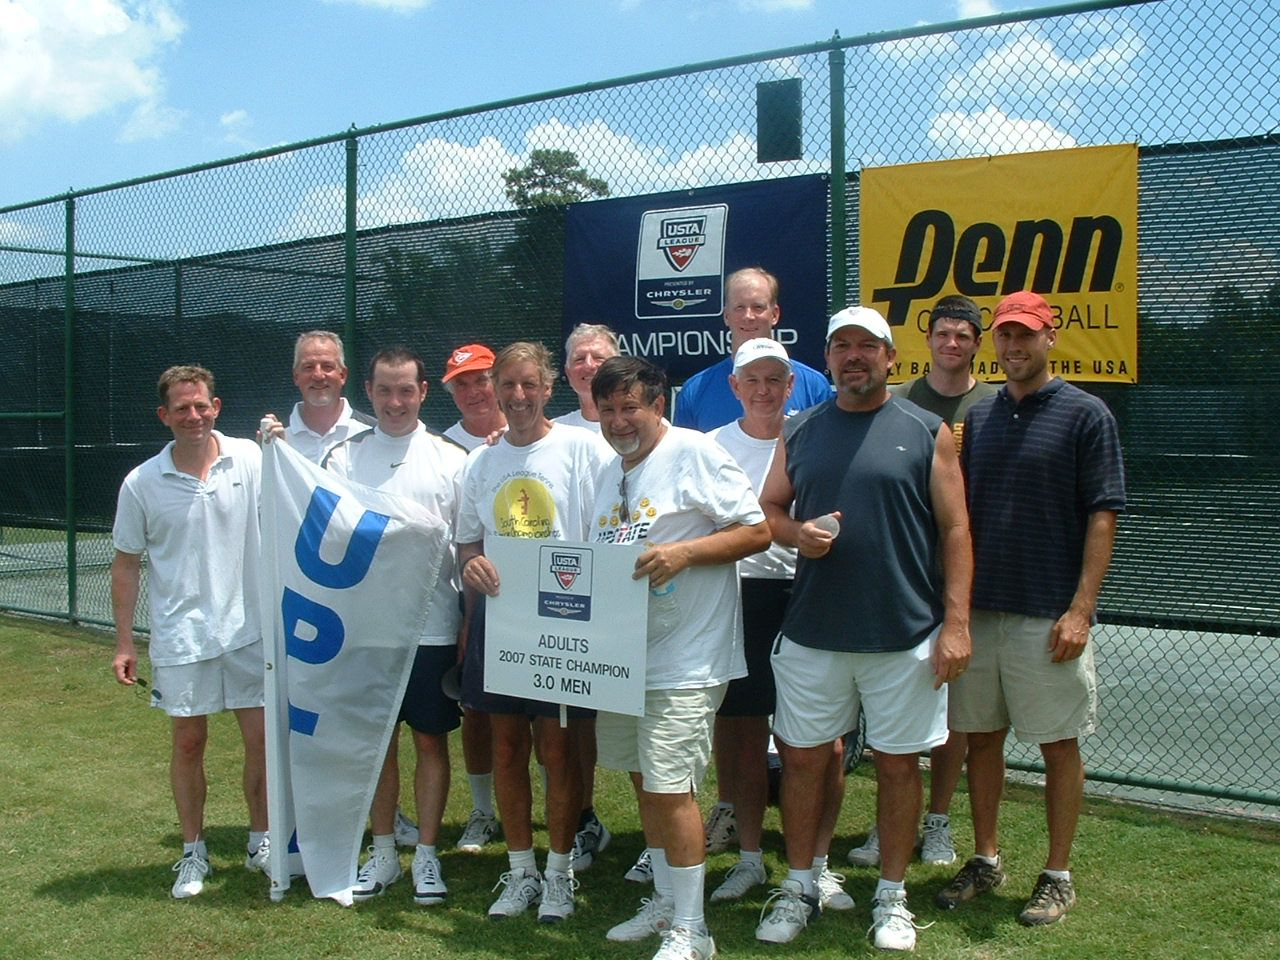 2007 Adult Champs 3.0 M Champs